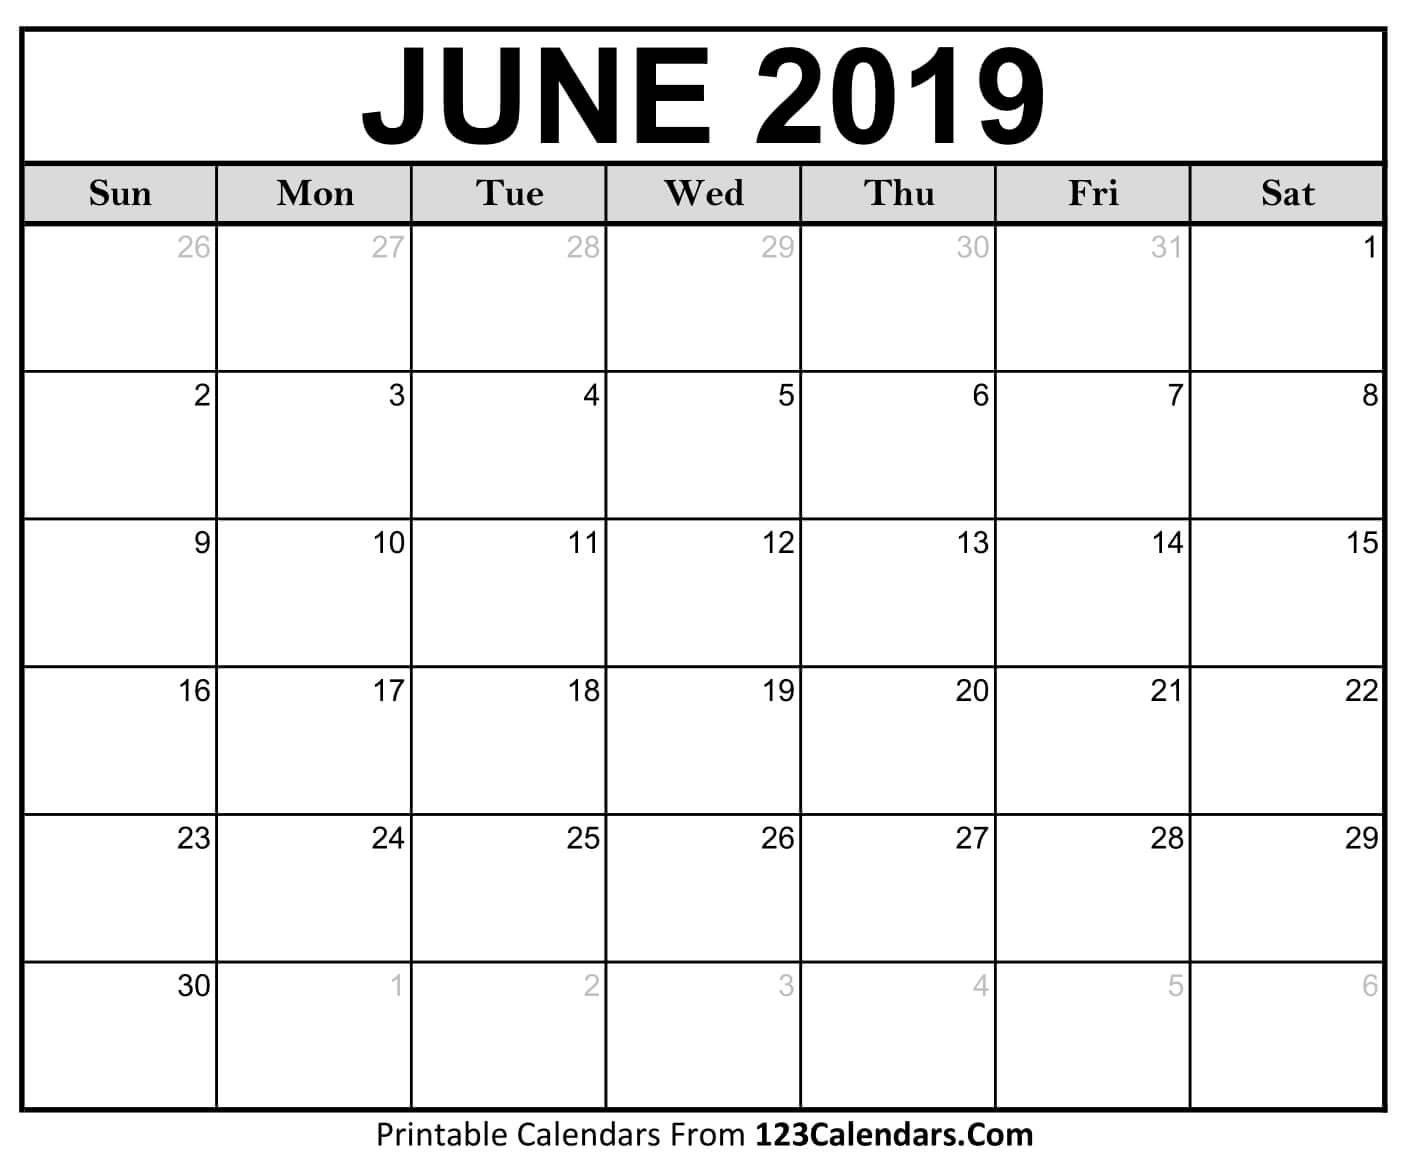 Printable June 2019 Calendar Templates - 123Calendars Calendar 2019 June